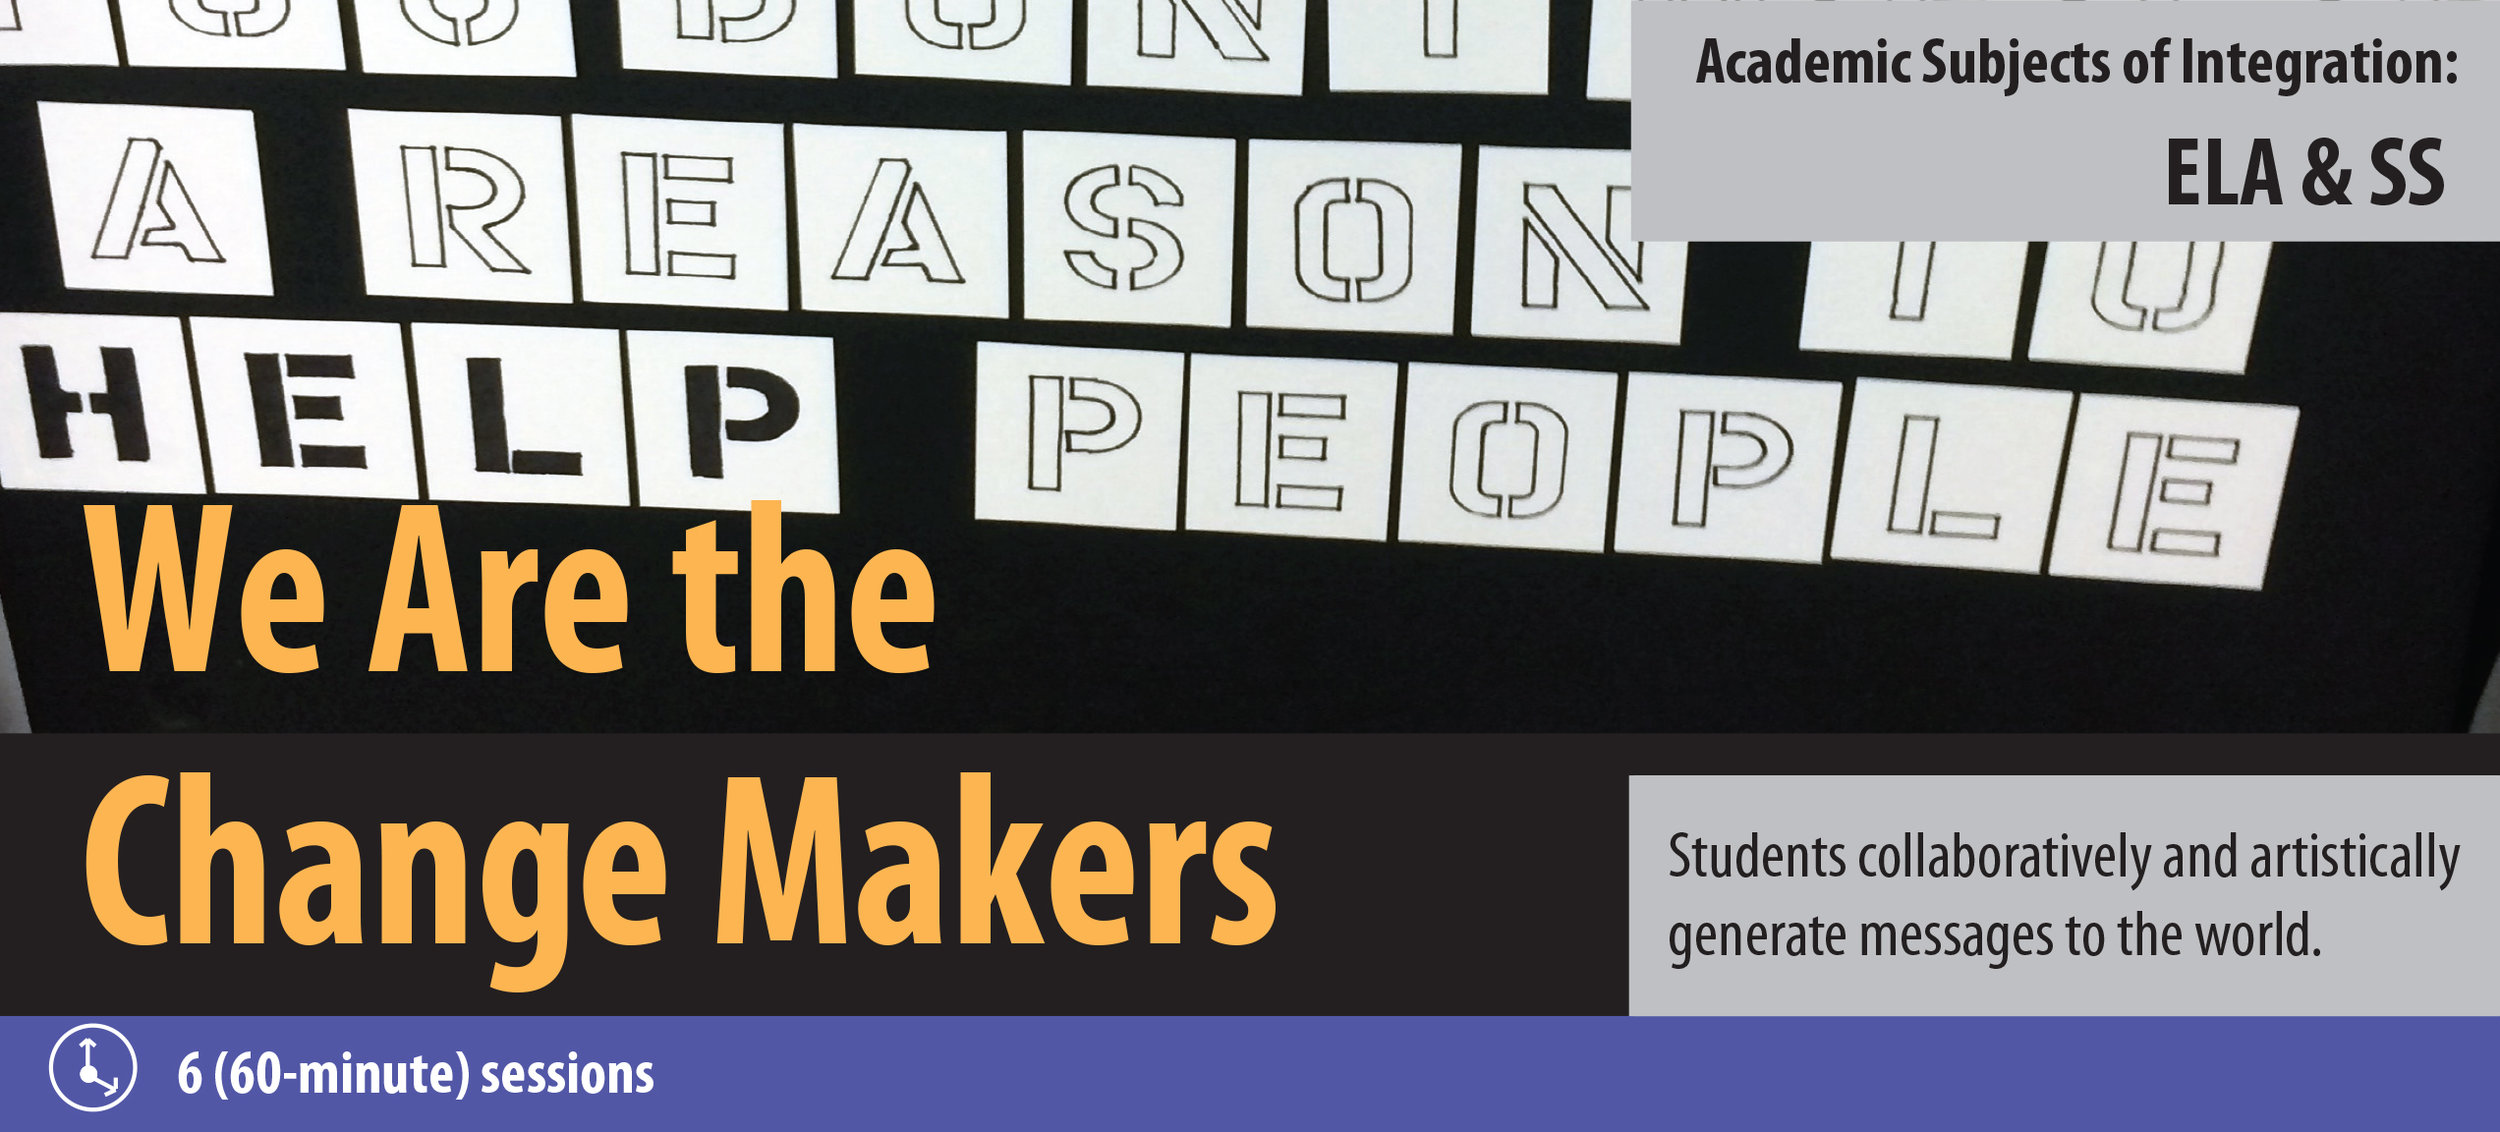 Change Makers_Action Plan_Header.jpg